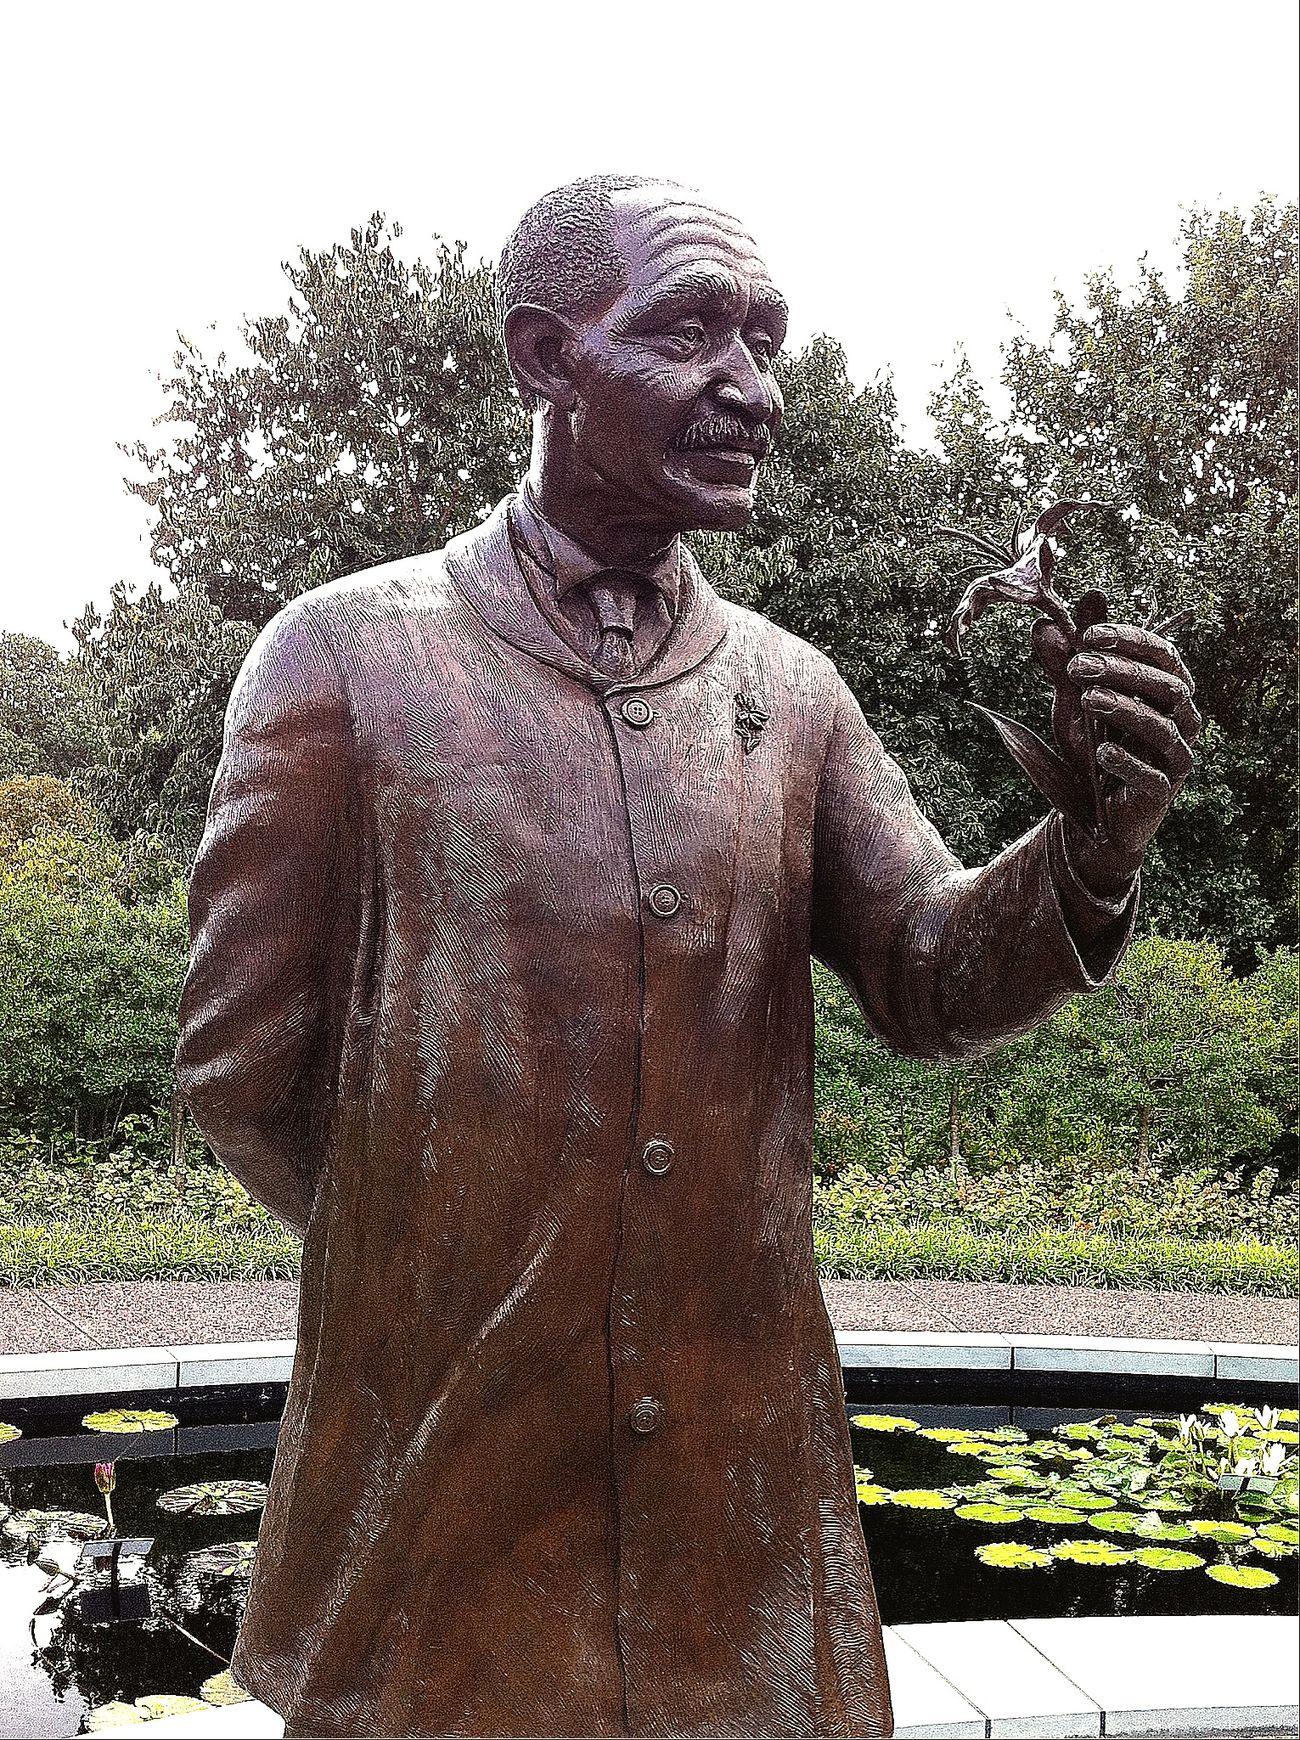 Secret Garden George Washington Carver statue in the Carver Garden in the Missouri Botanical Garden